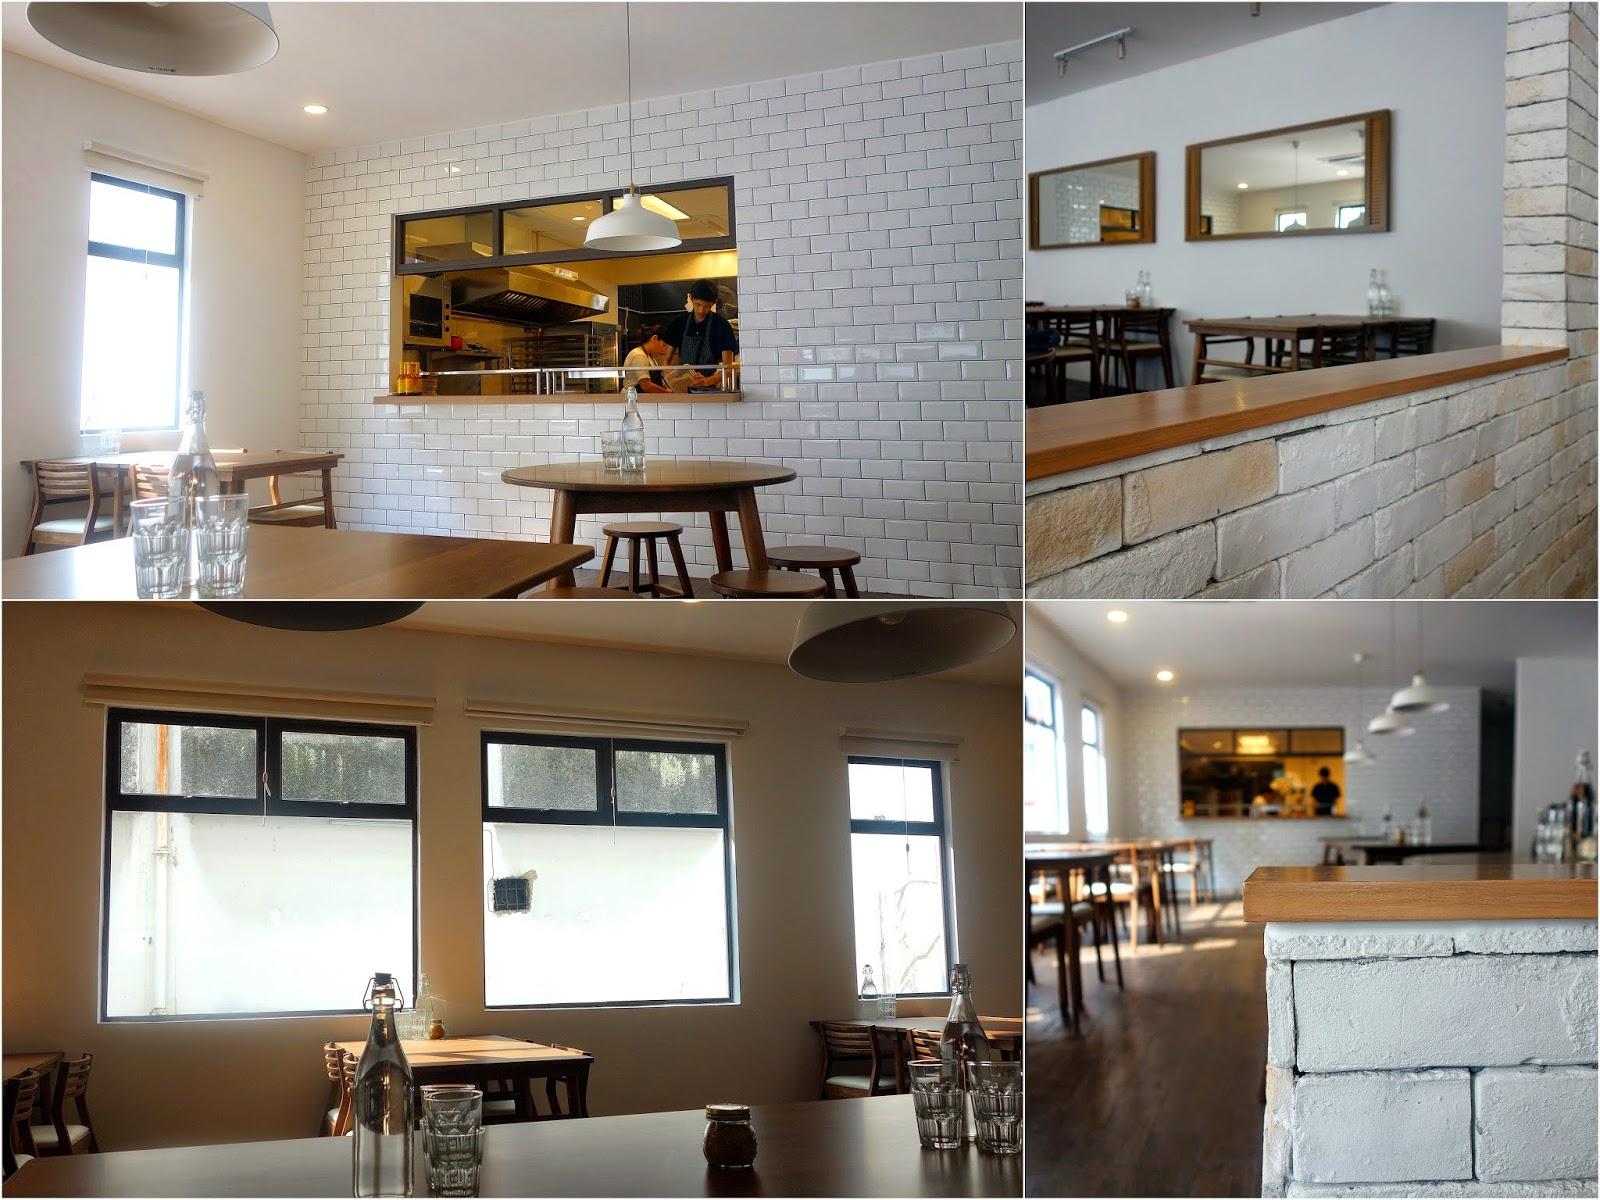 Eat drink kl the kitchen table restaurant bakery for Table 52 brunch menu